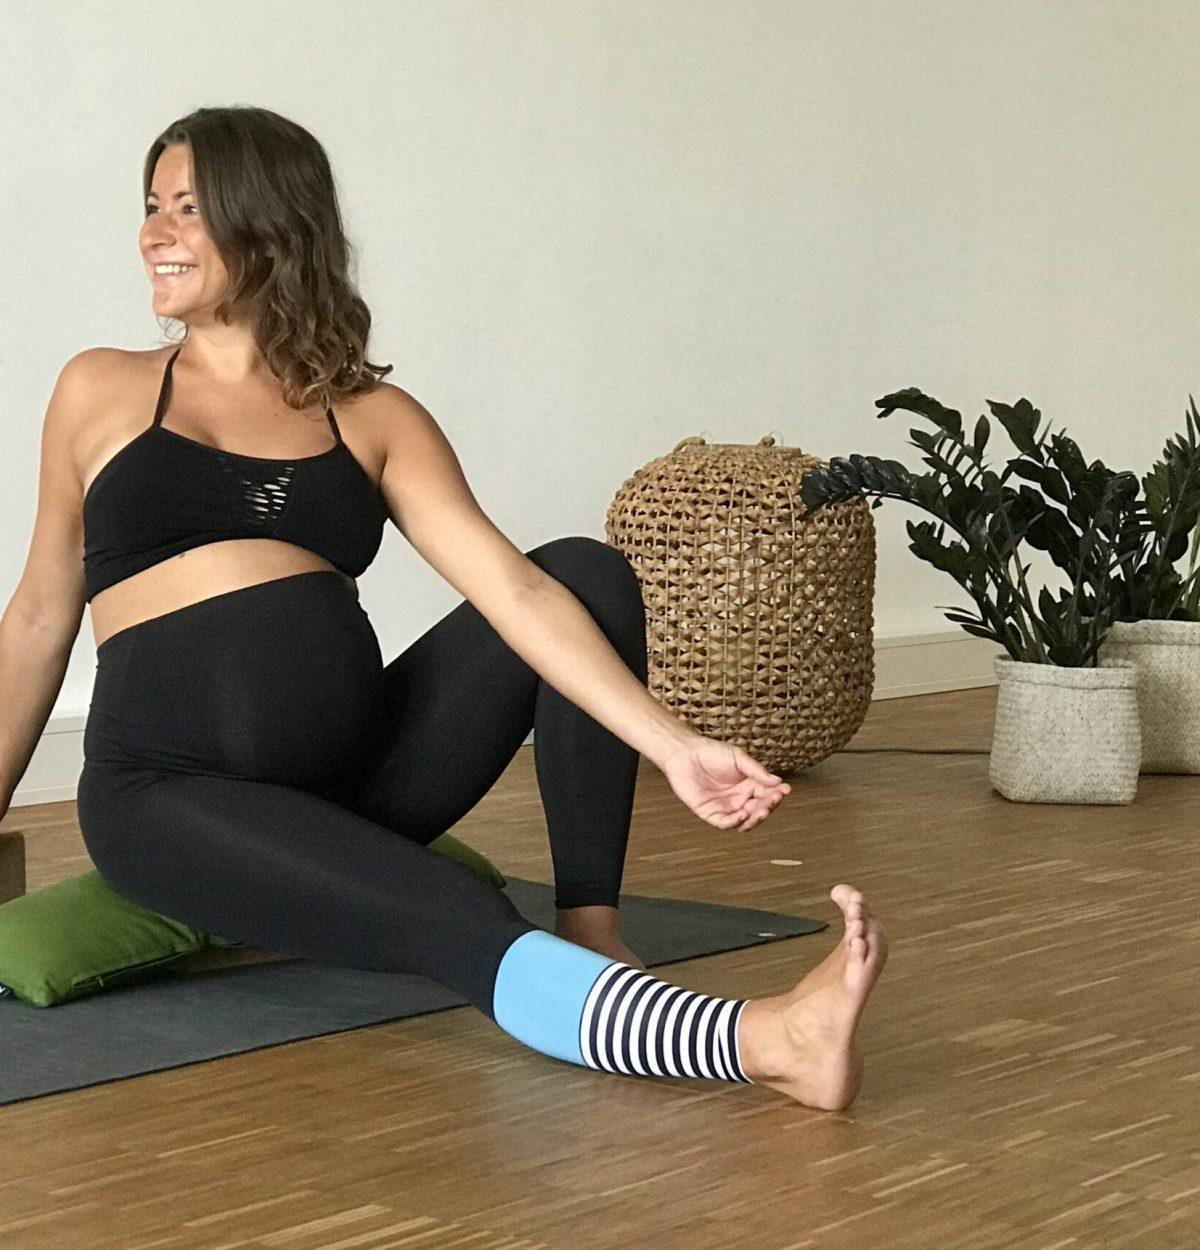 YogaMAnufaktur-Wuerzburg-prenatal-kurs-schwangerschaft-min (2)